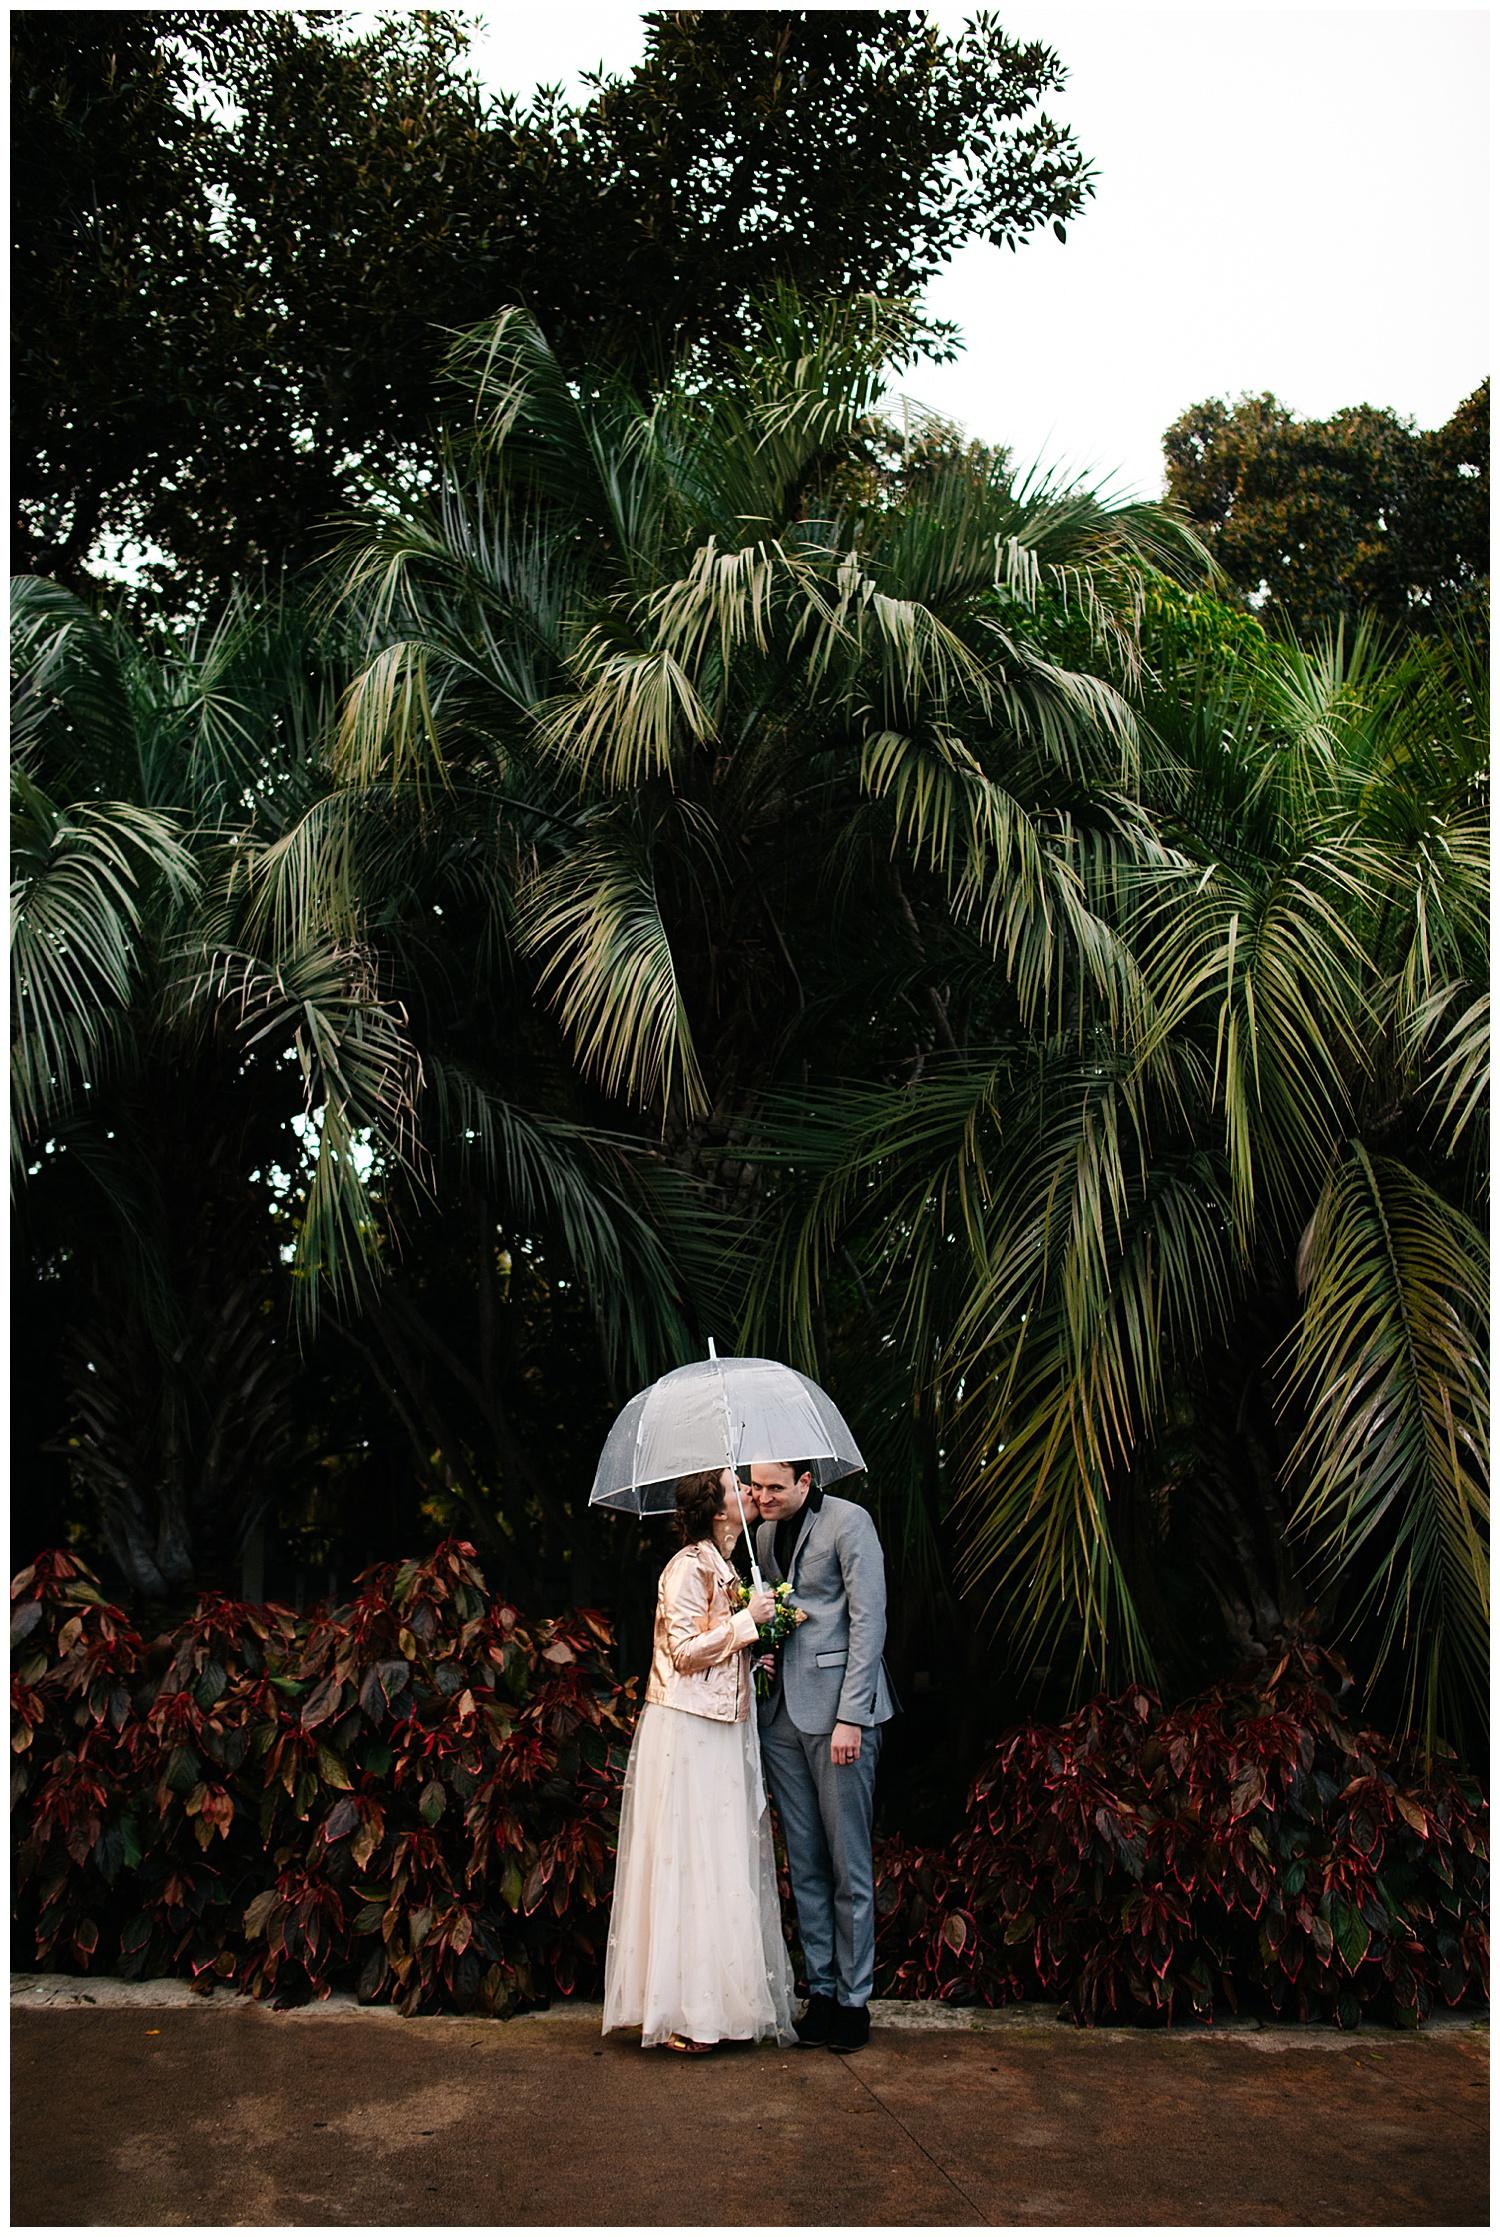 SamEricaStudios - San Diego Wedding Photographer - Galaxy Themed Rainy Day Wedding Parq West San Diego_0029.jpg